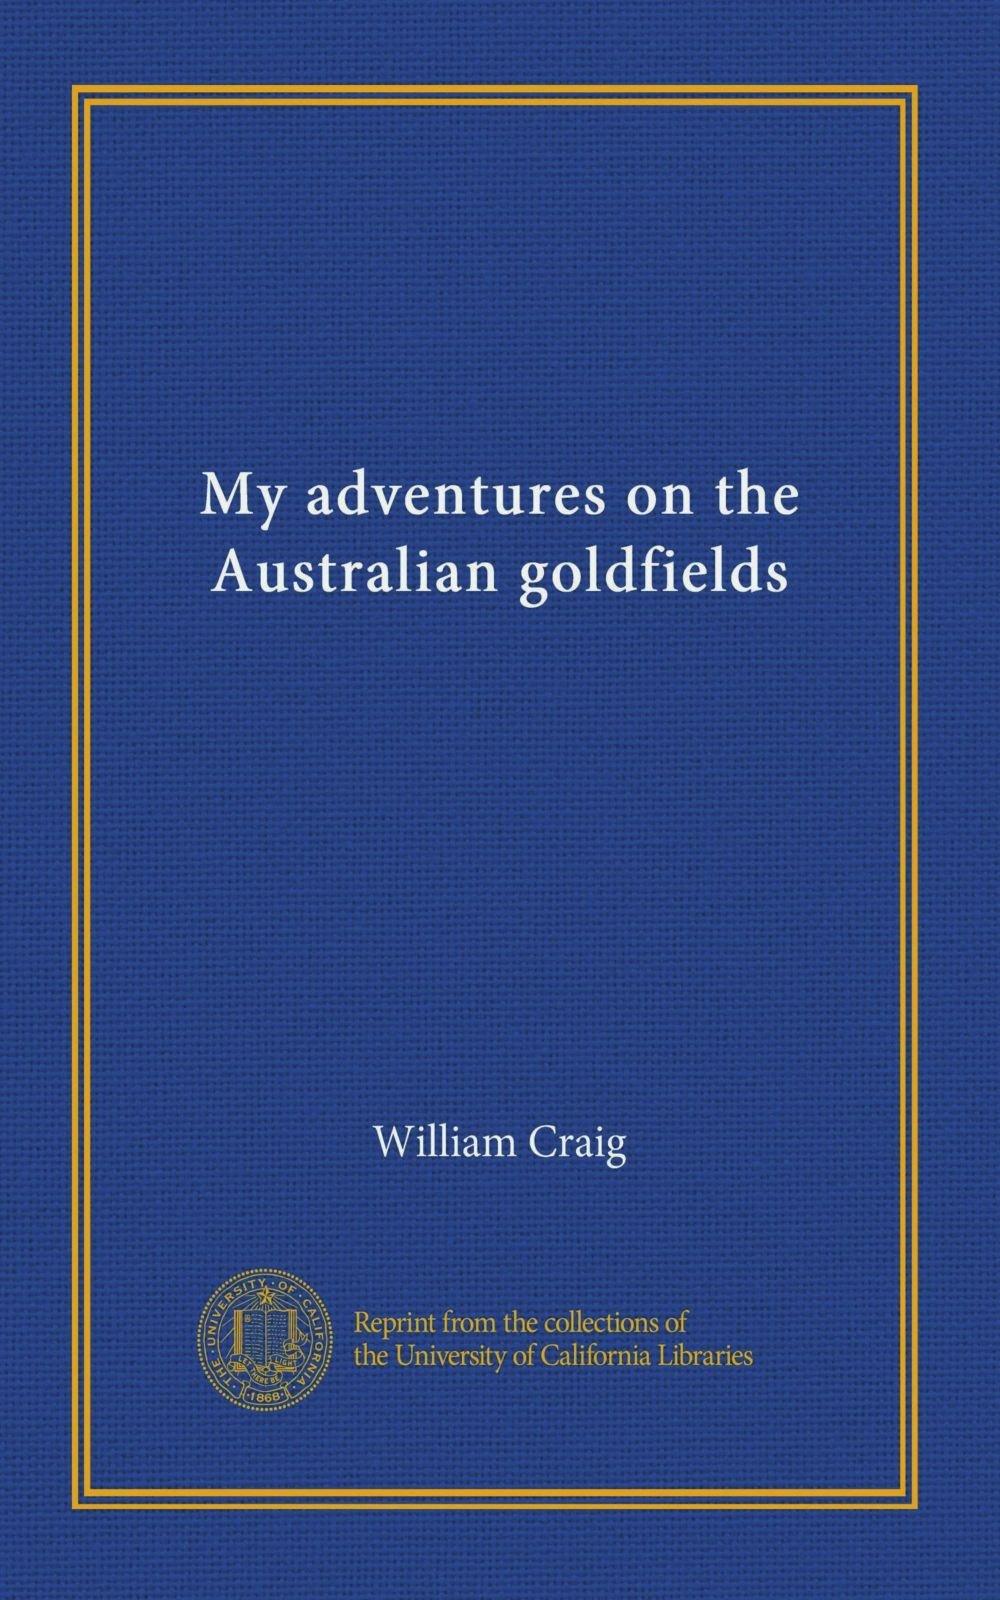 Download My adventures on the Australian goldfields ebook